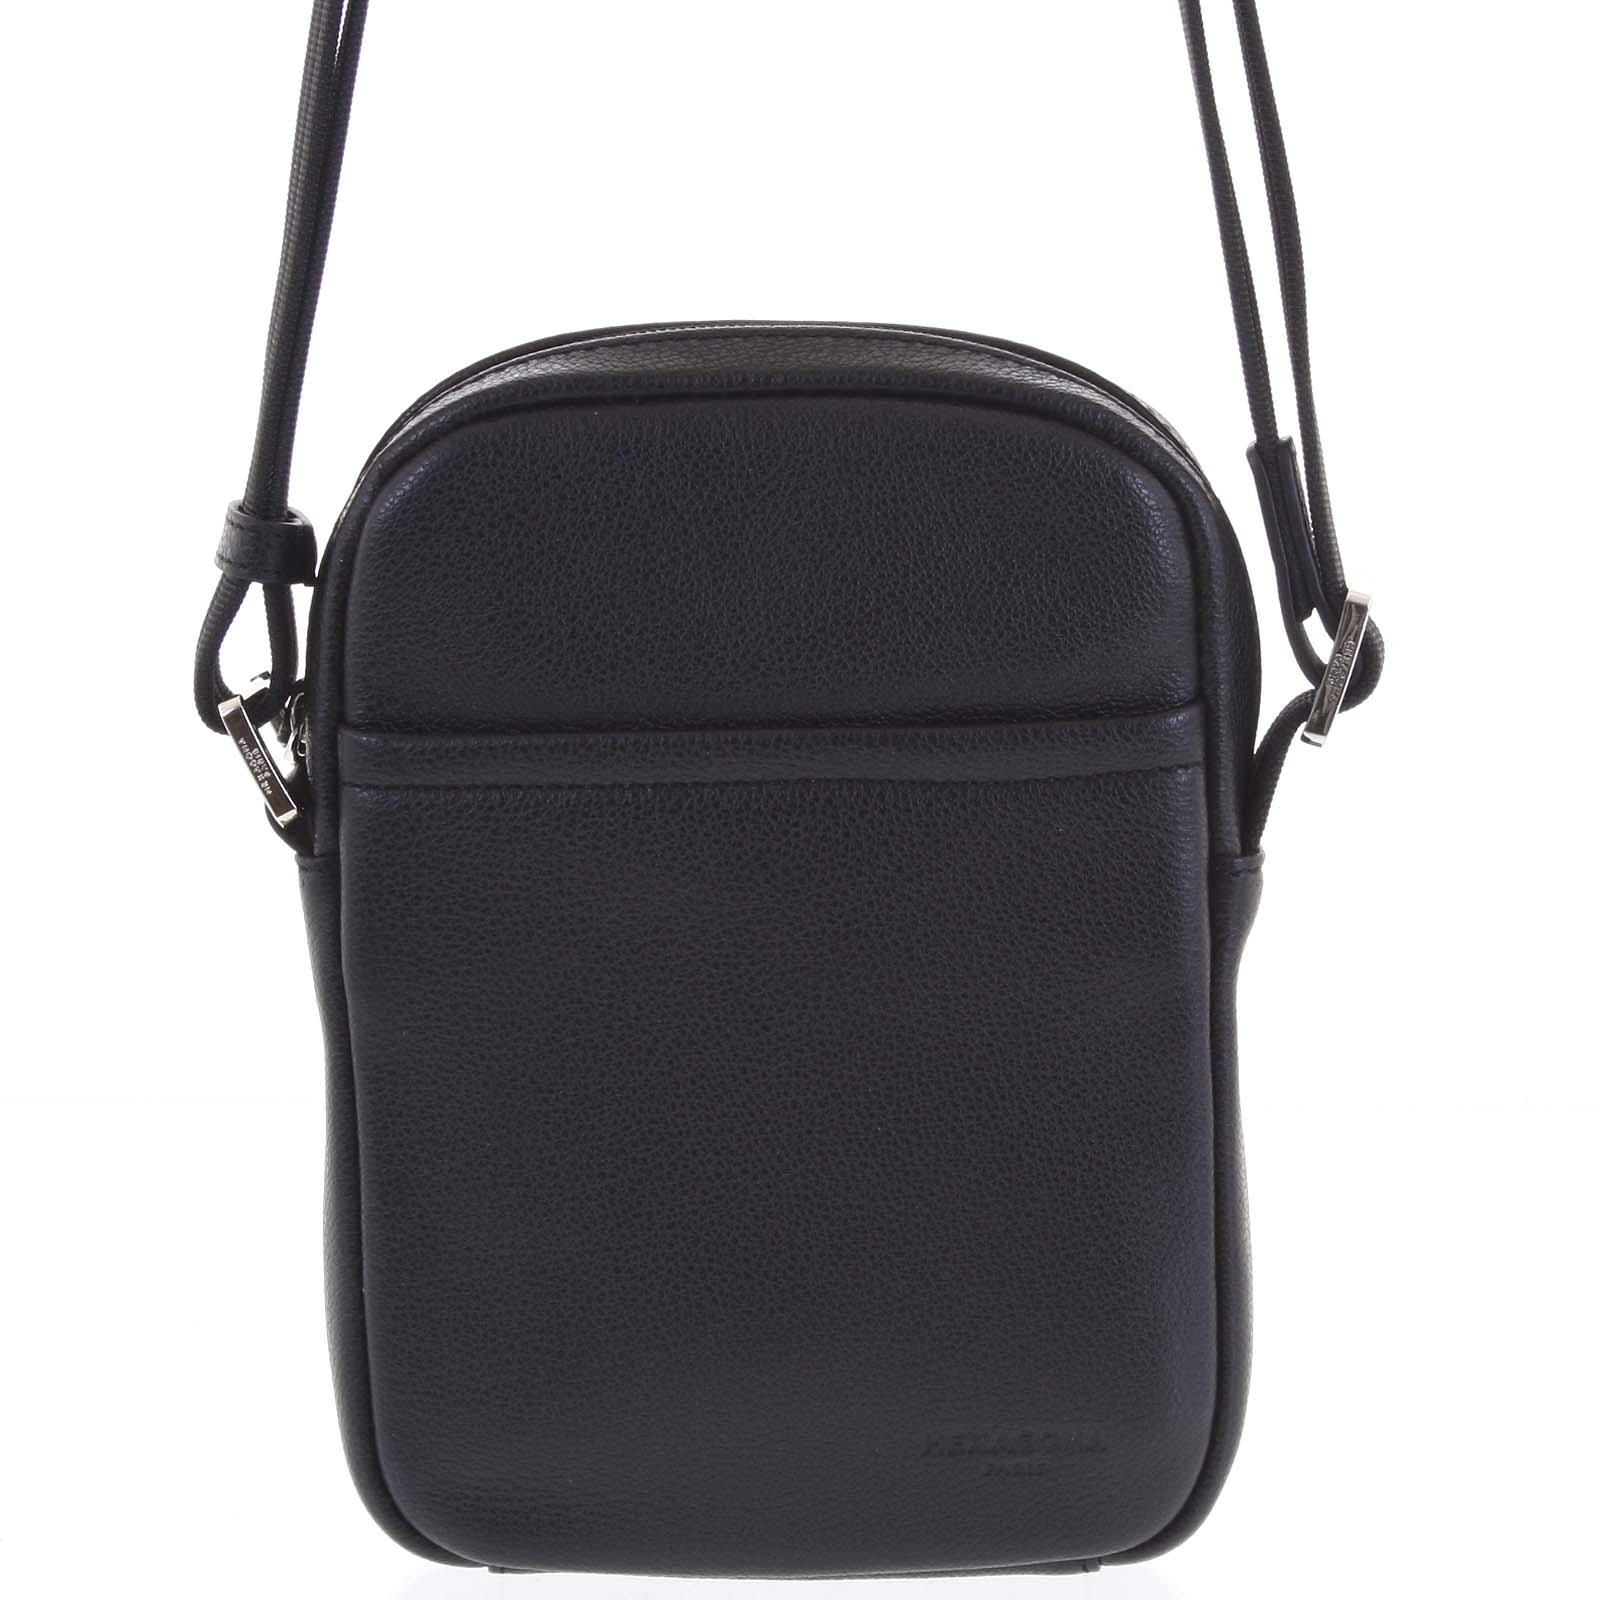 Pánská kožená taška na doklady černá - Hexagona Yesterday